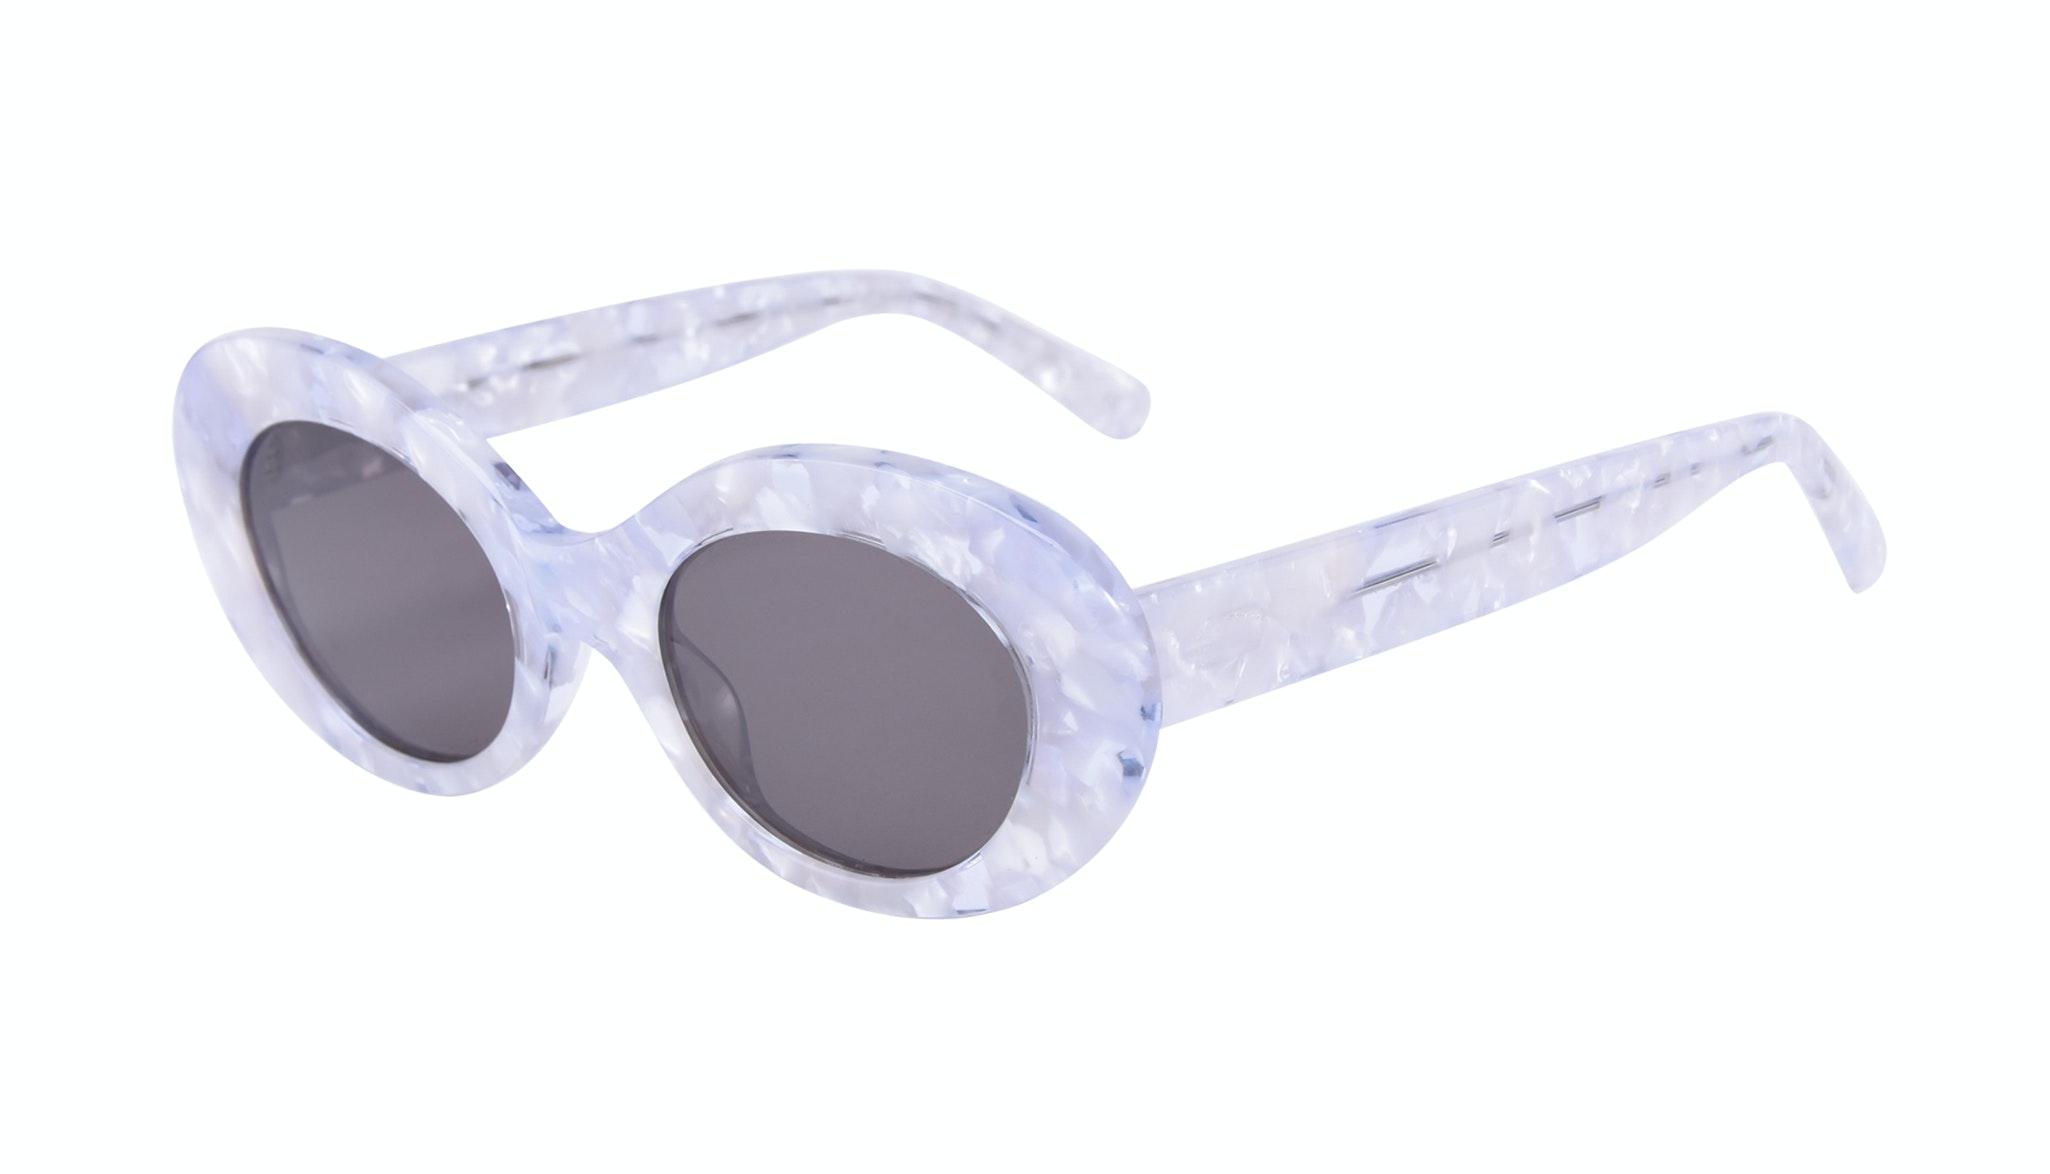 Affordable Fashion Glasses Round Sunglasses Women Galactic Moon Tilt